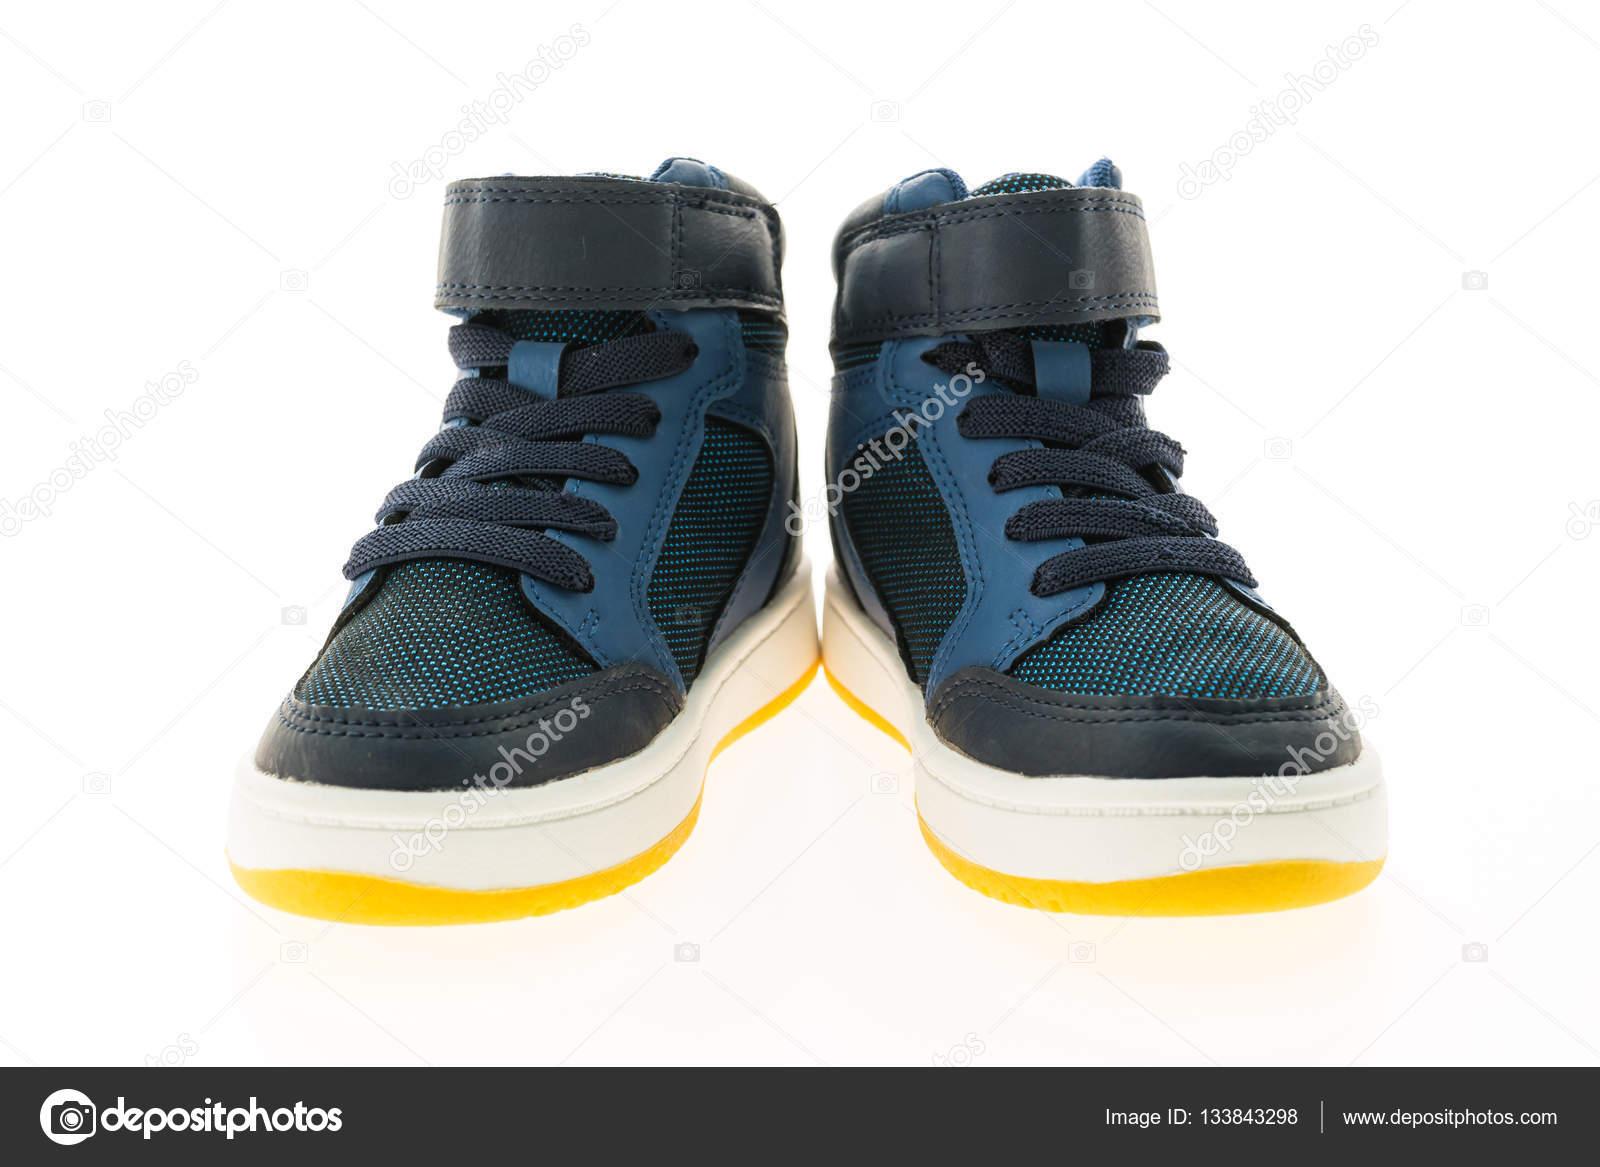 e0bea3e4dab Μόδα παπούτσια και αθλητικά — Φωτογραφία Αρχείου © mrsiraphol #133843298